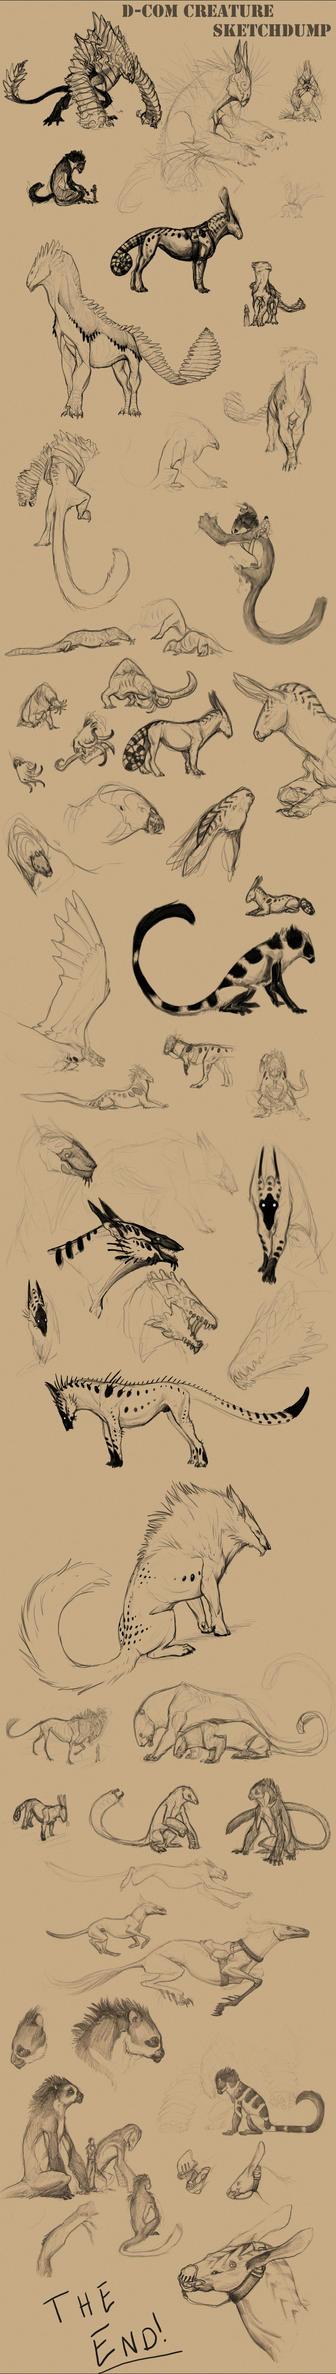 D-COM Creature Sketchdump by 86Caskin